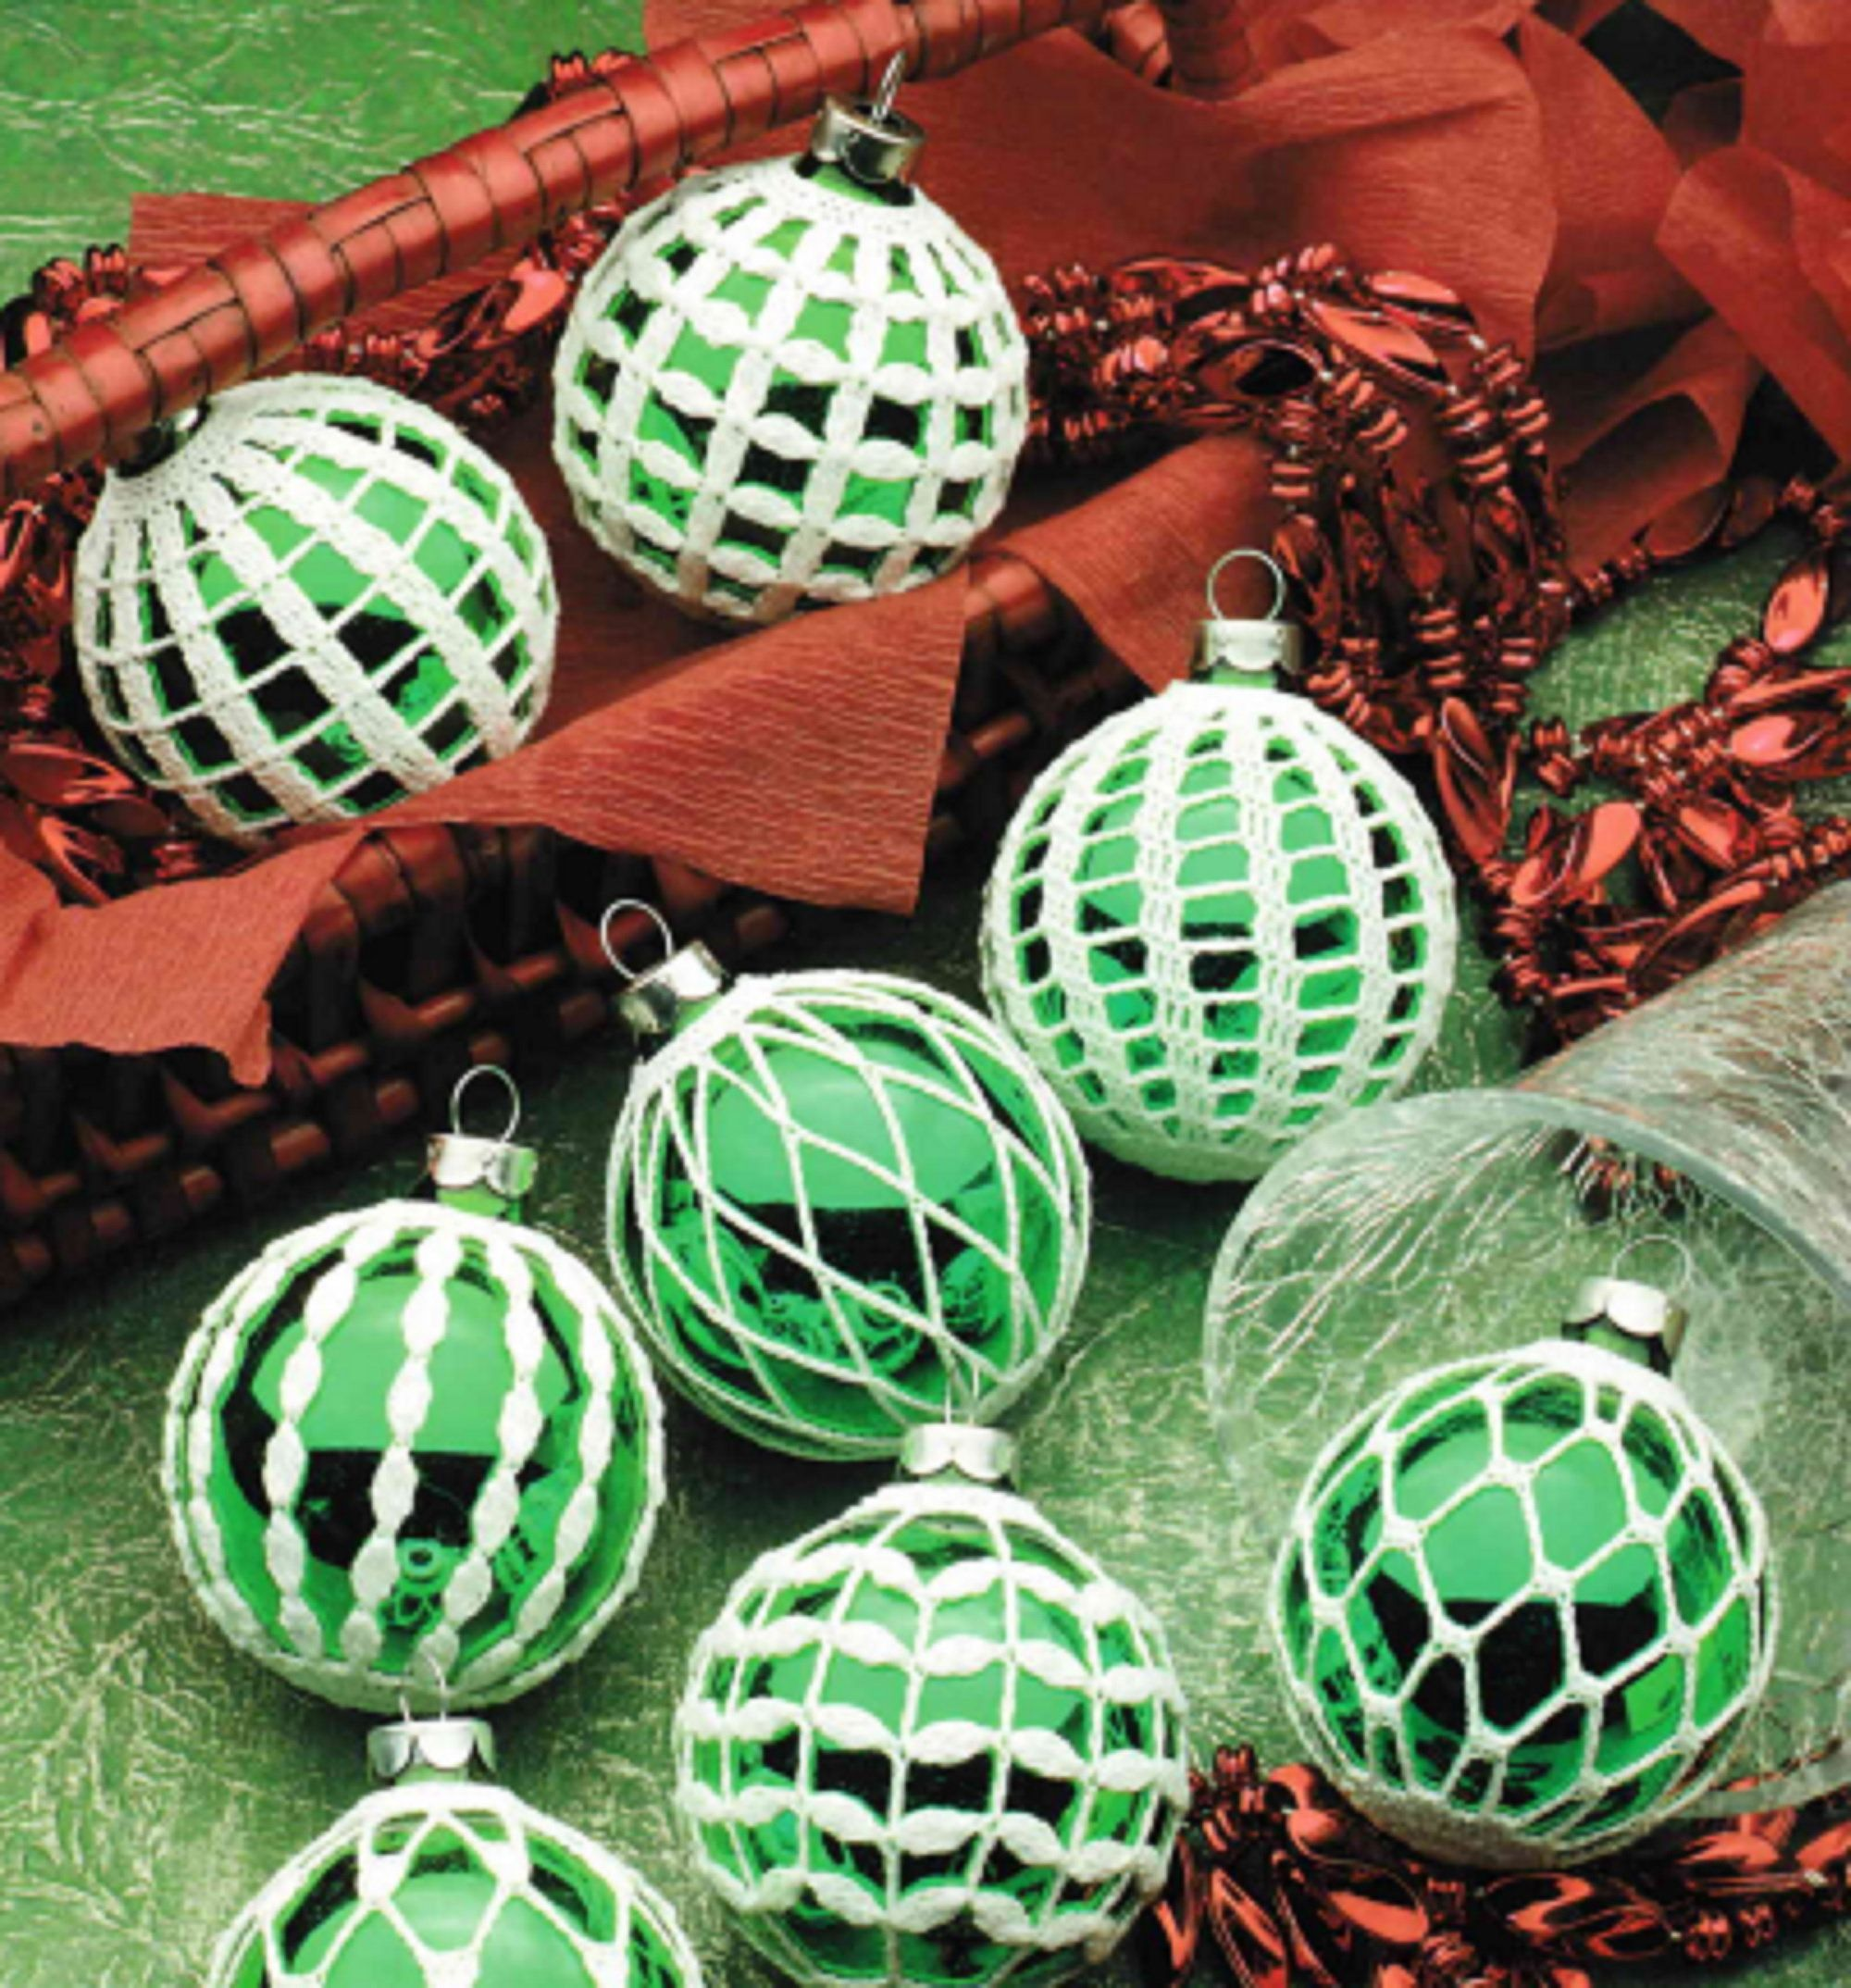 Thread Crochet Pattern Pdf Instant Download Christmas Balls Etsy In 2021 Tree Decor Crochet Patterns Crochet Christmas Ornaments